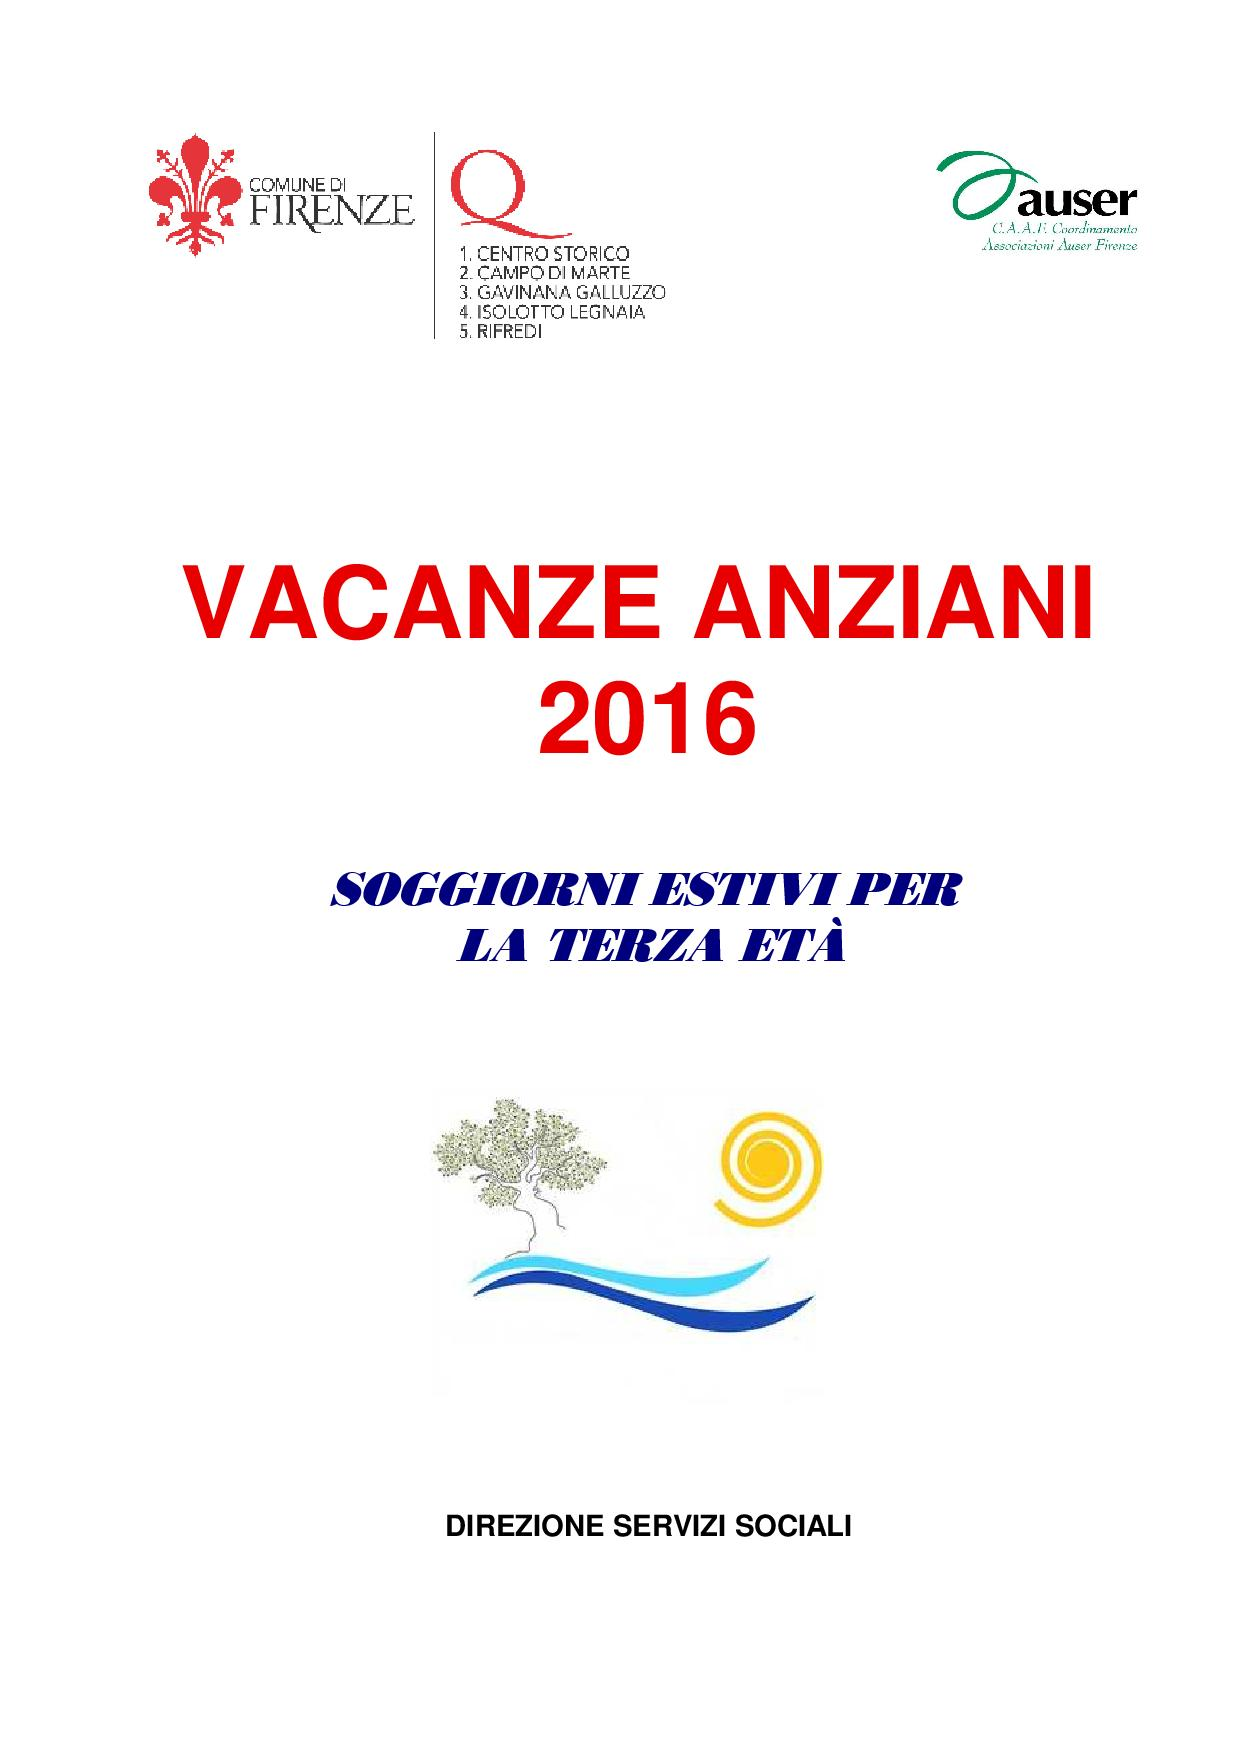 VOLANTINO-Vacanze Anziani 2016(1)-page-001